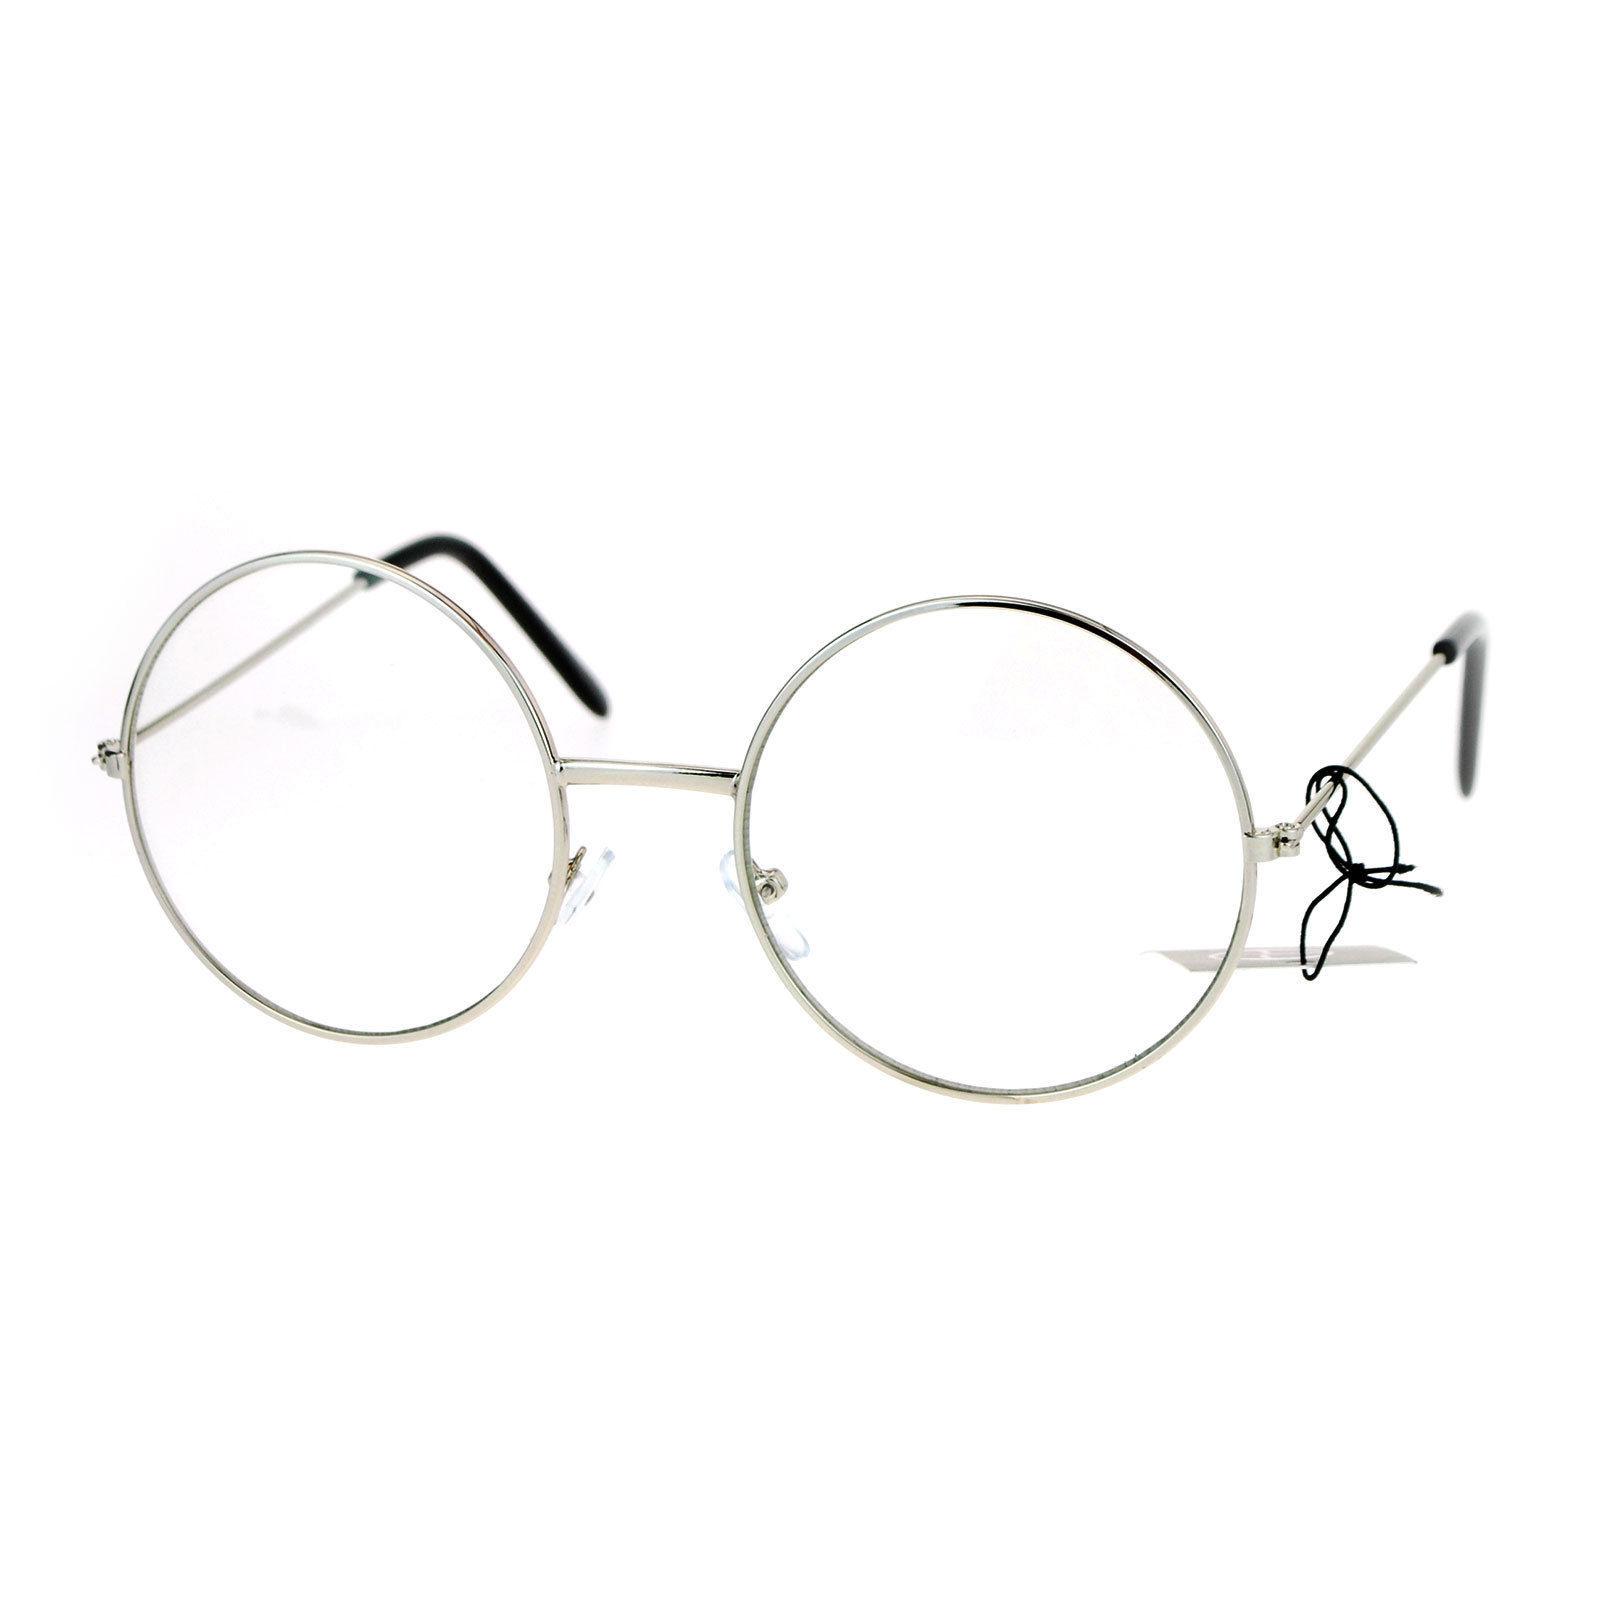 Clear Lens Eyeglasses Unisex Fashion Round Circle Metal Frame UV 400